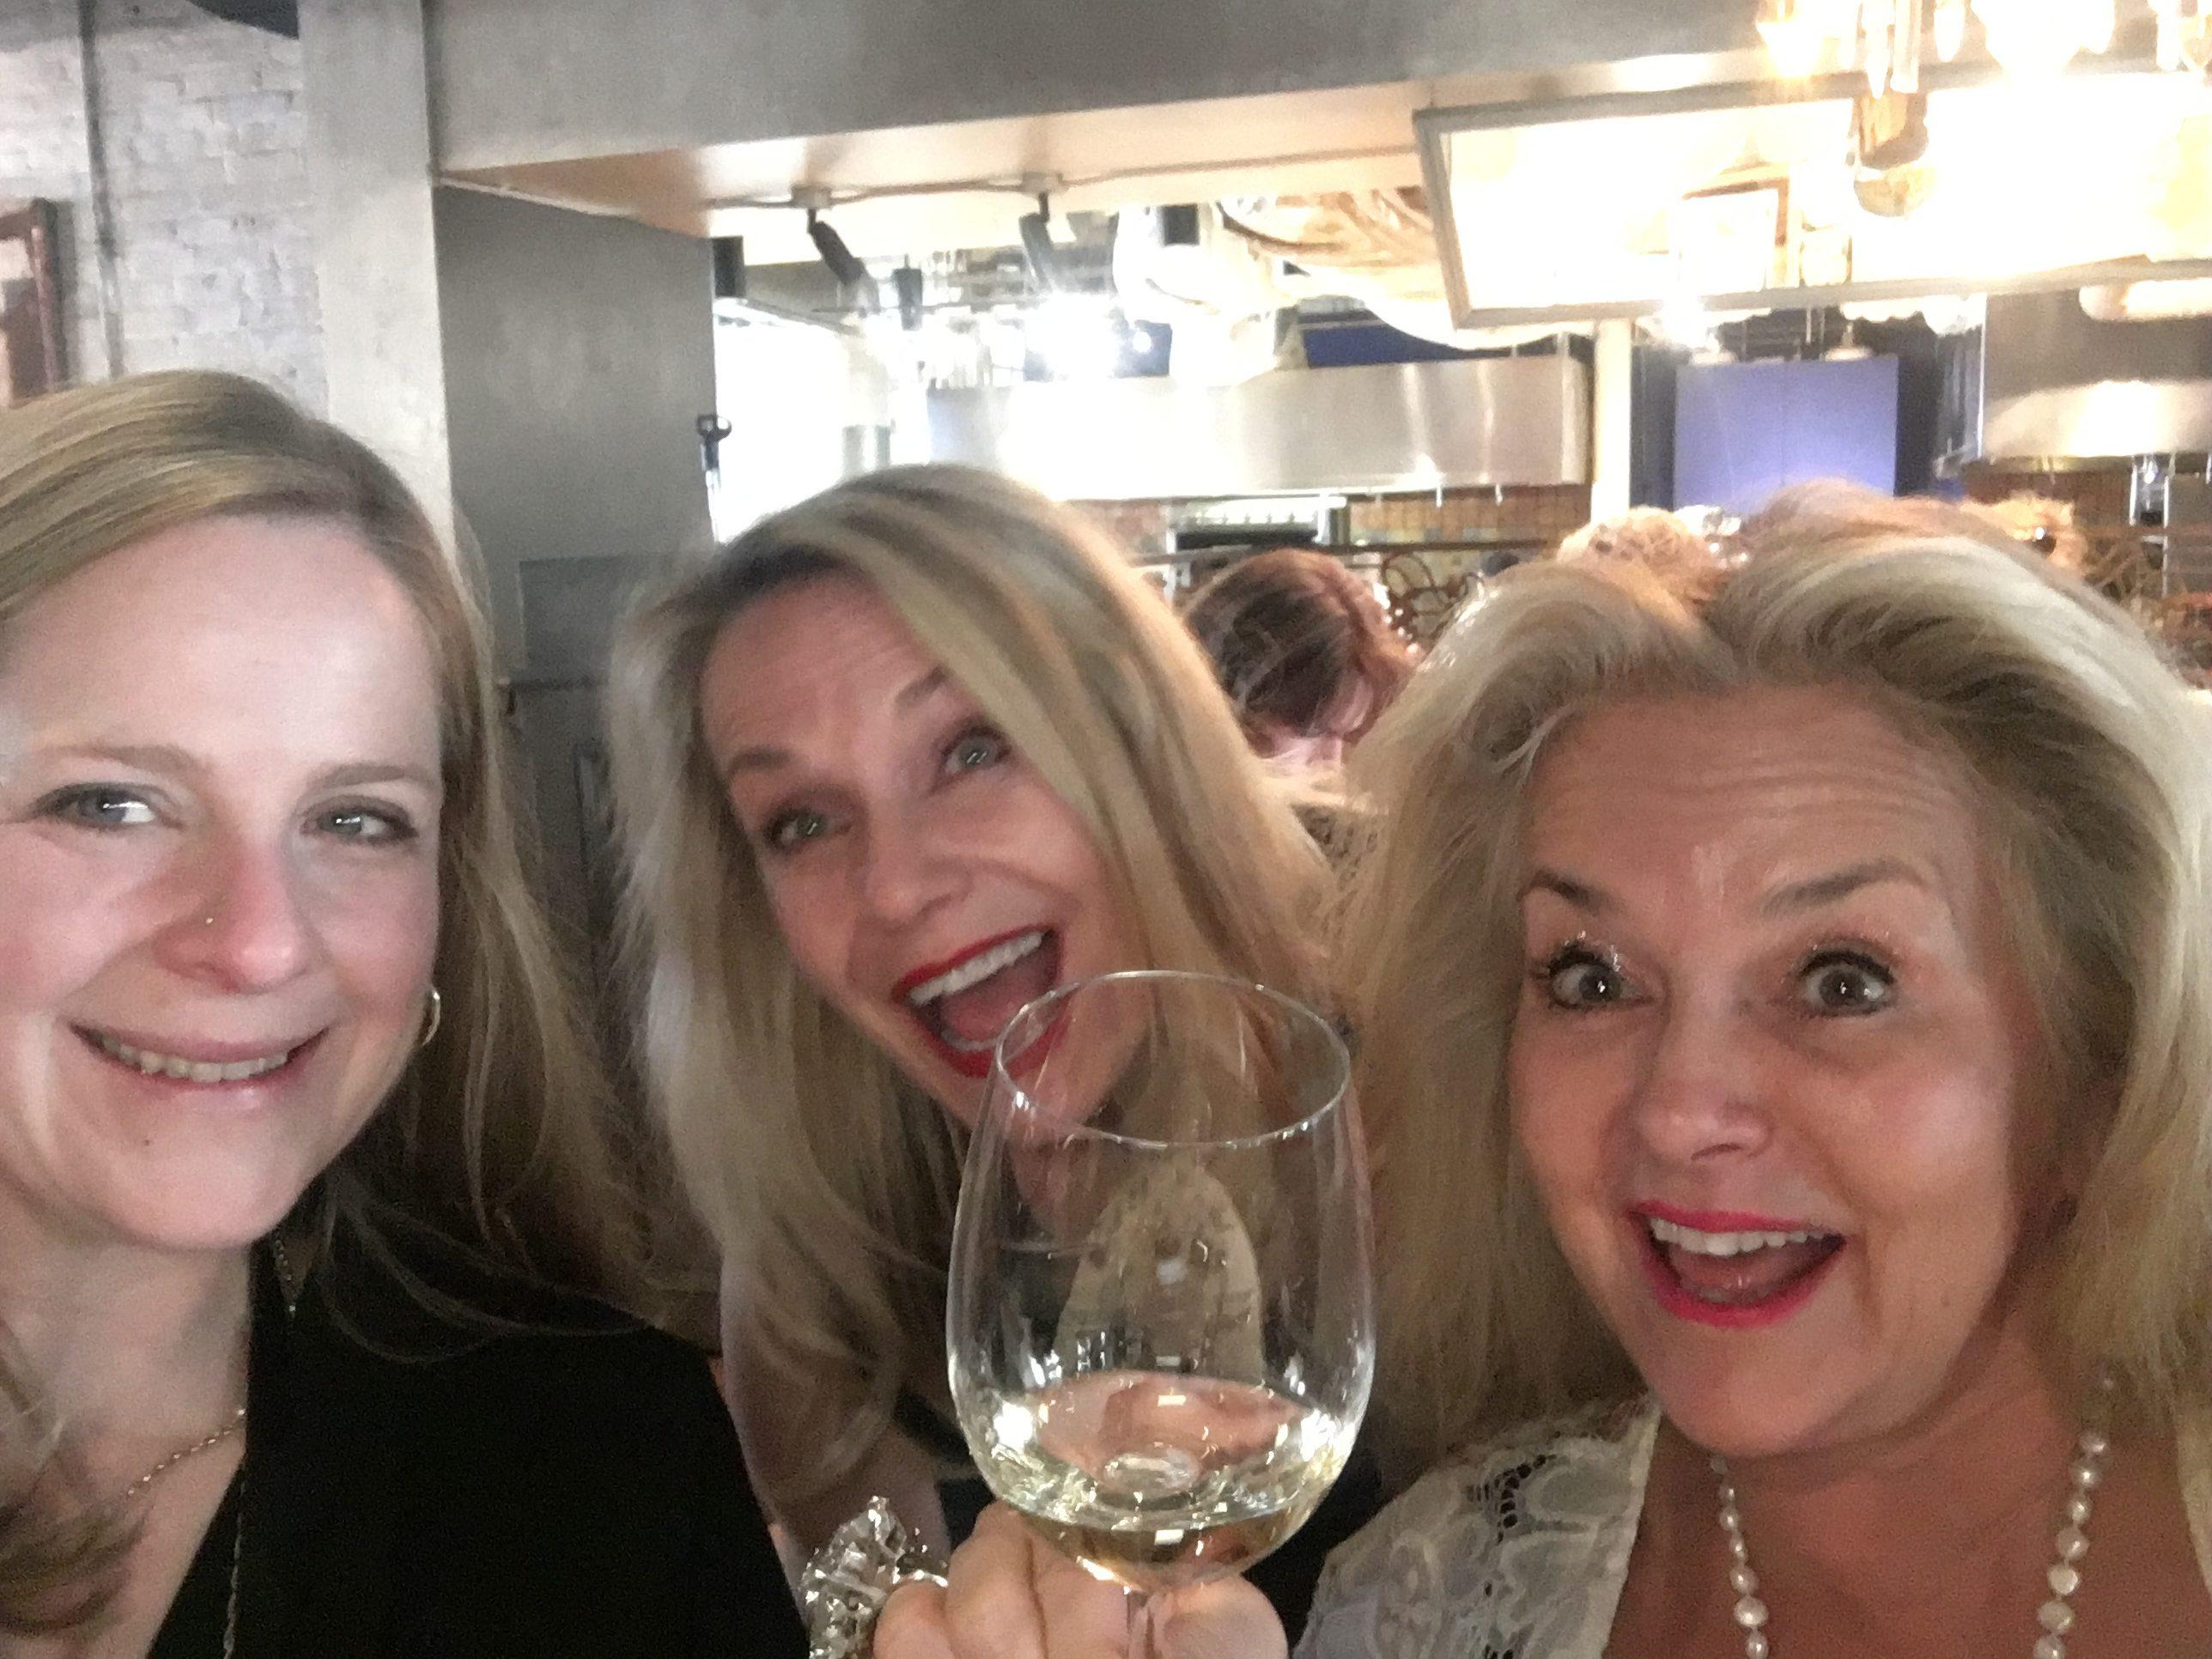 Selfie time with Megan Schofield, winemaker Robert Monday Winery! We had a blast! Adieu until we meet again!